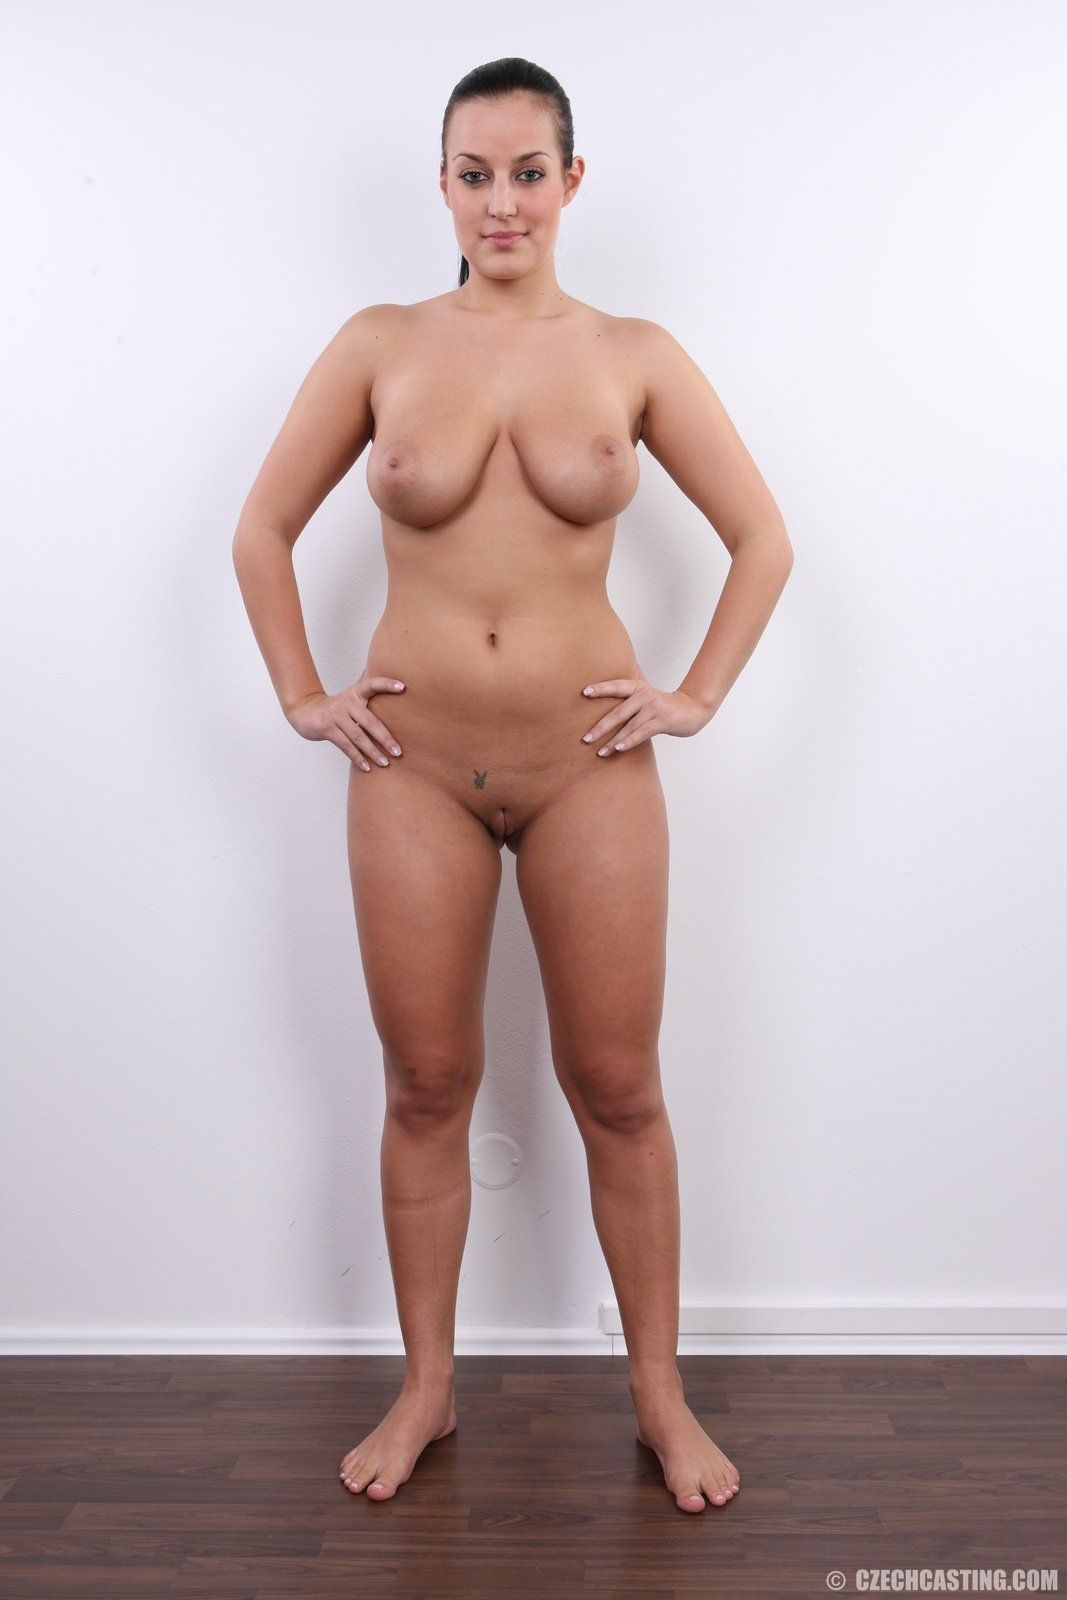 Meet bi sexual women